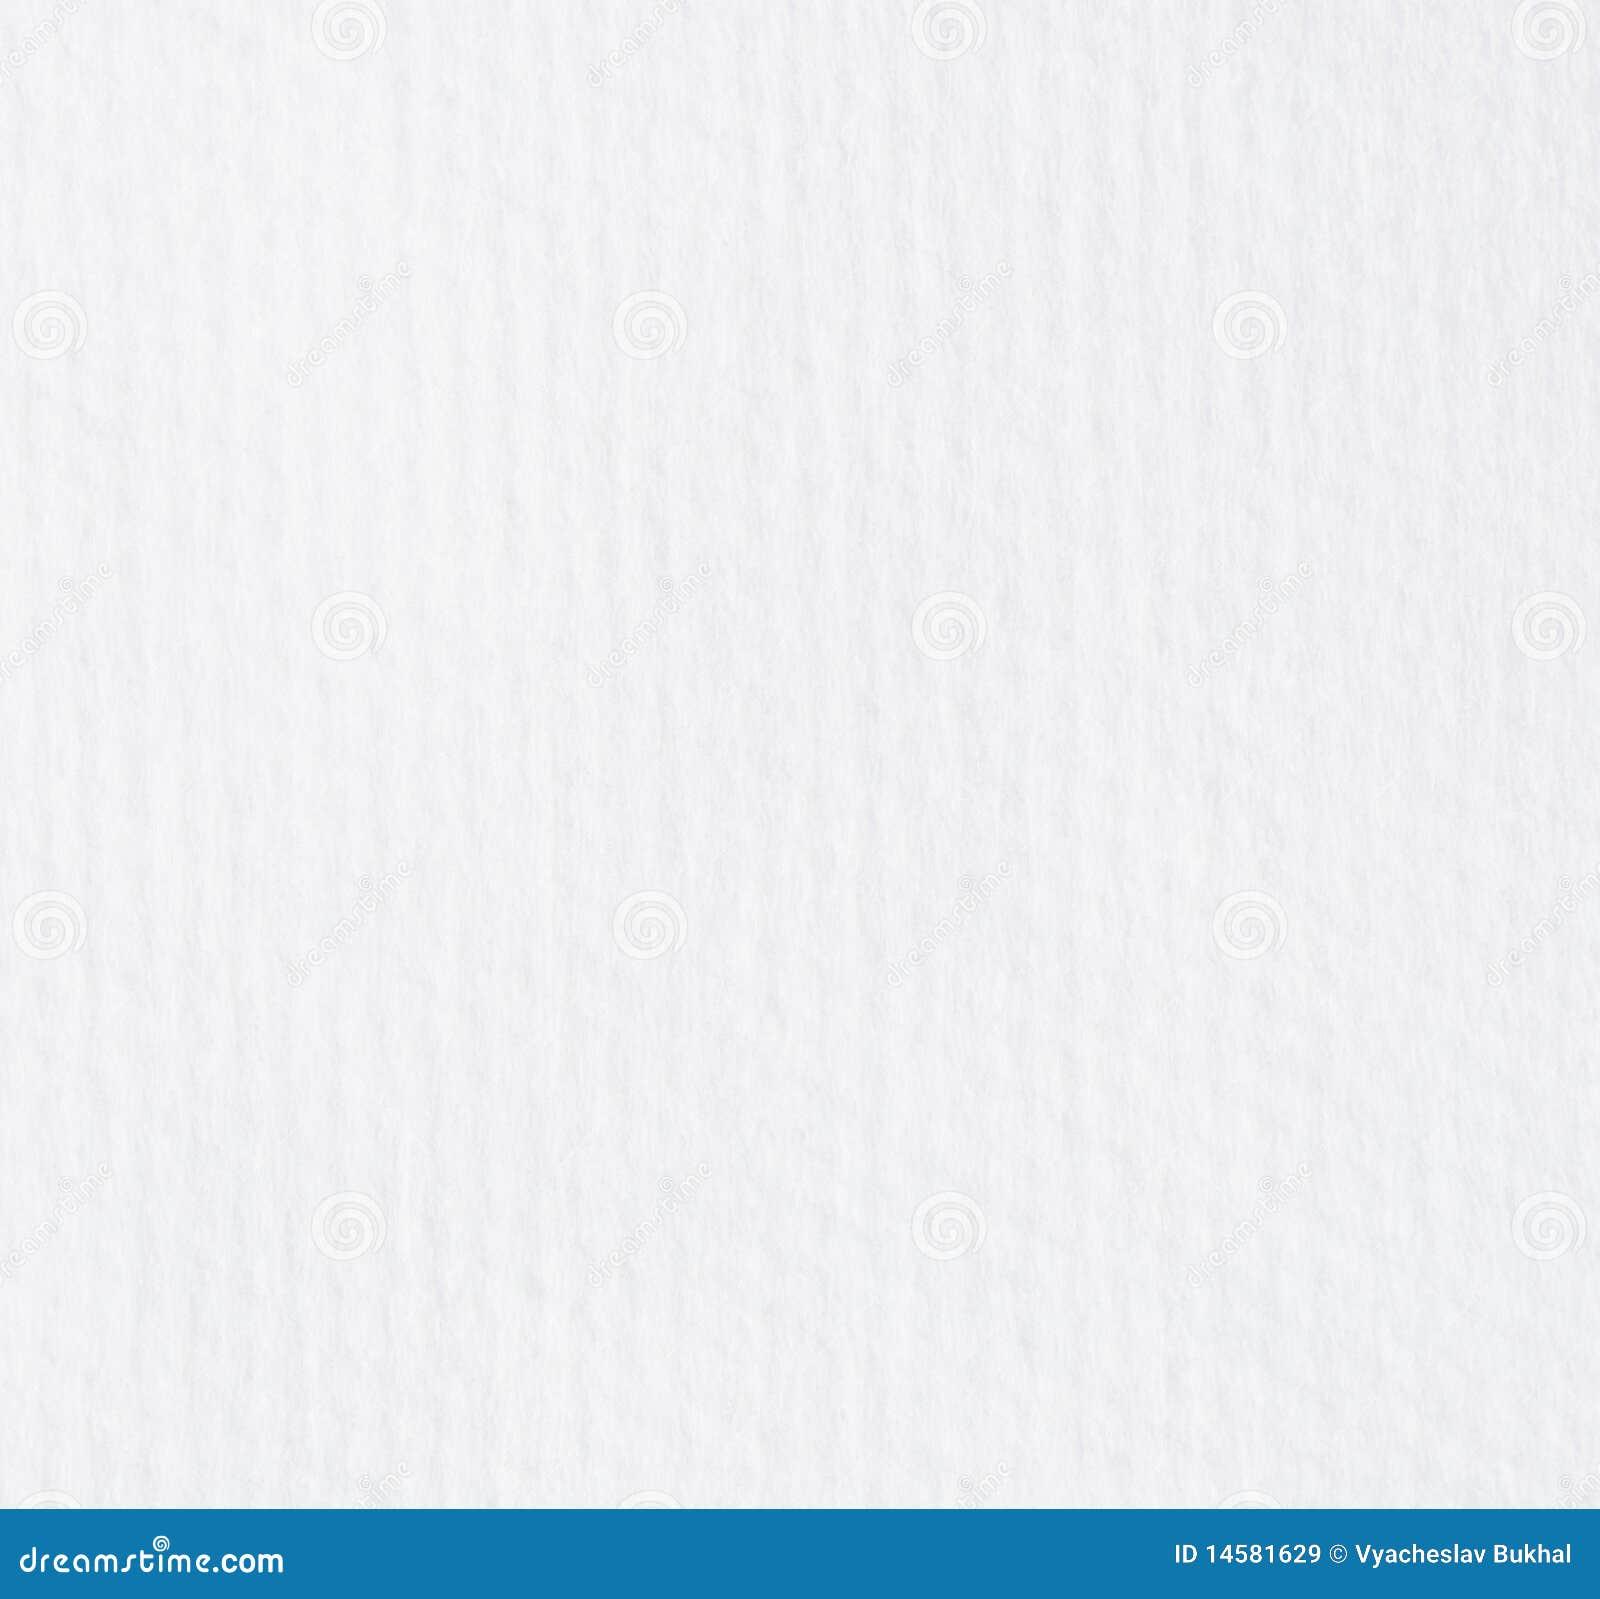 white paper legal term